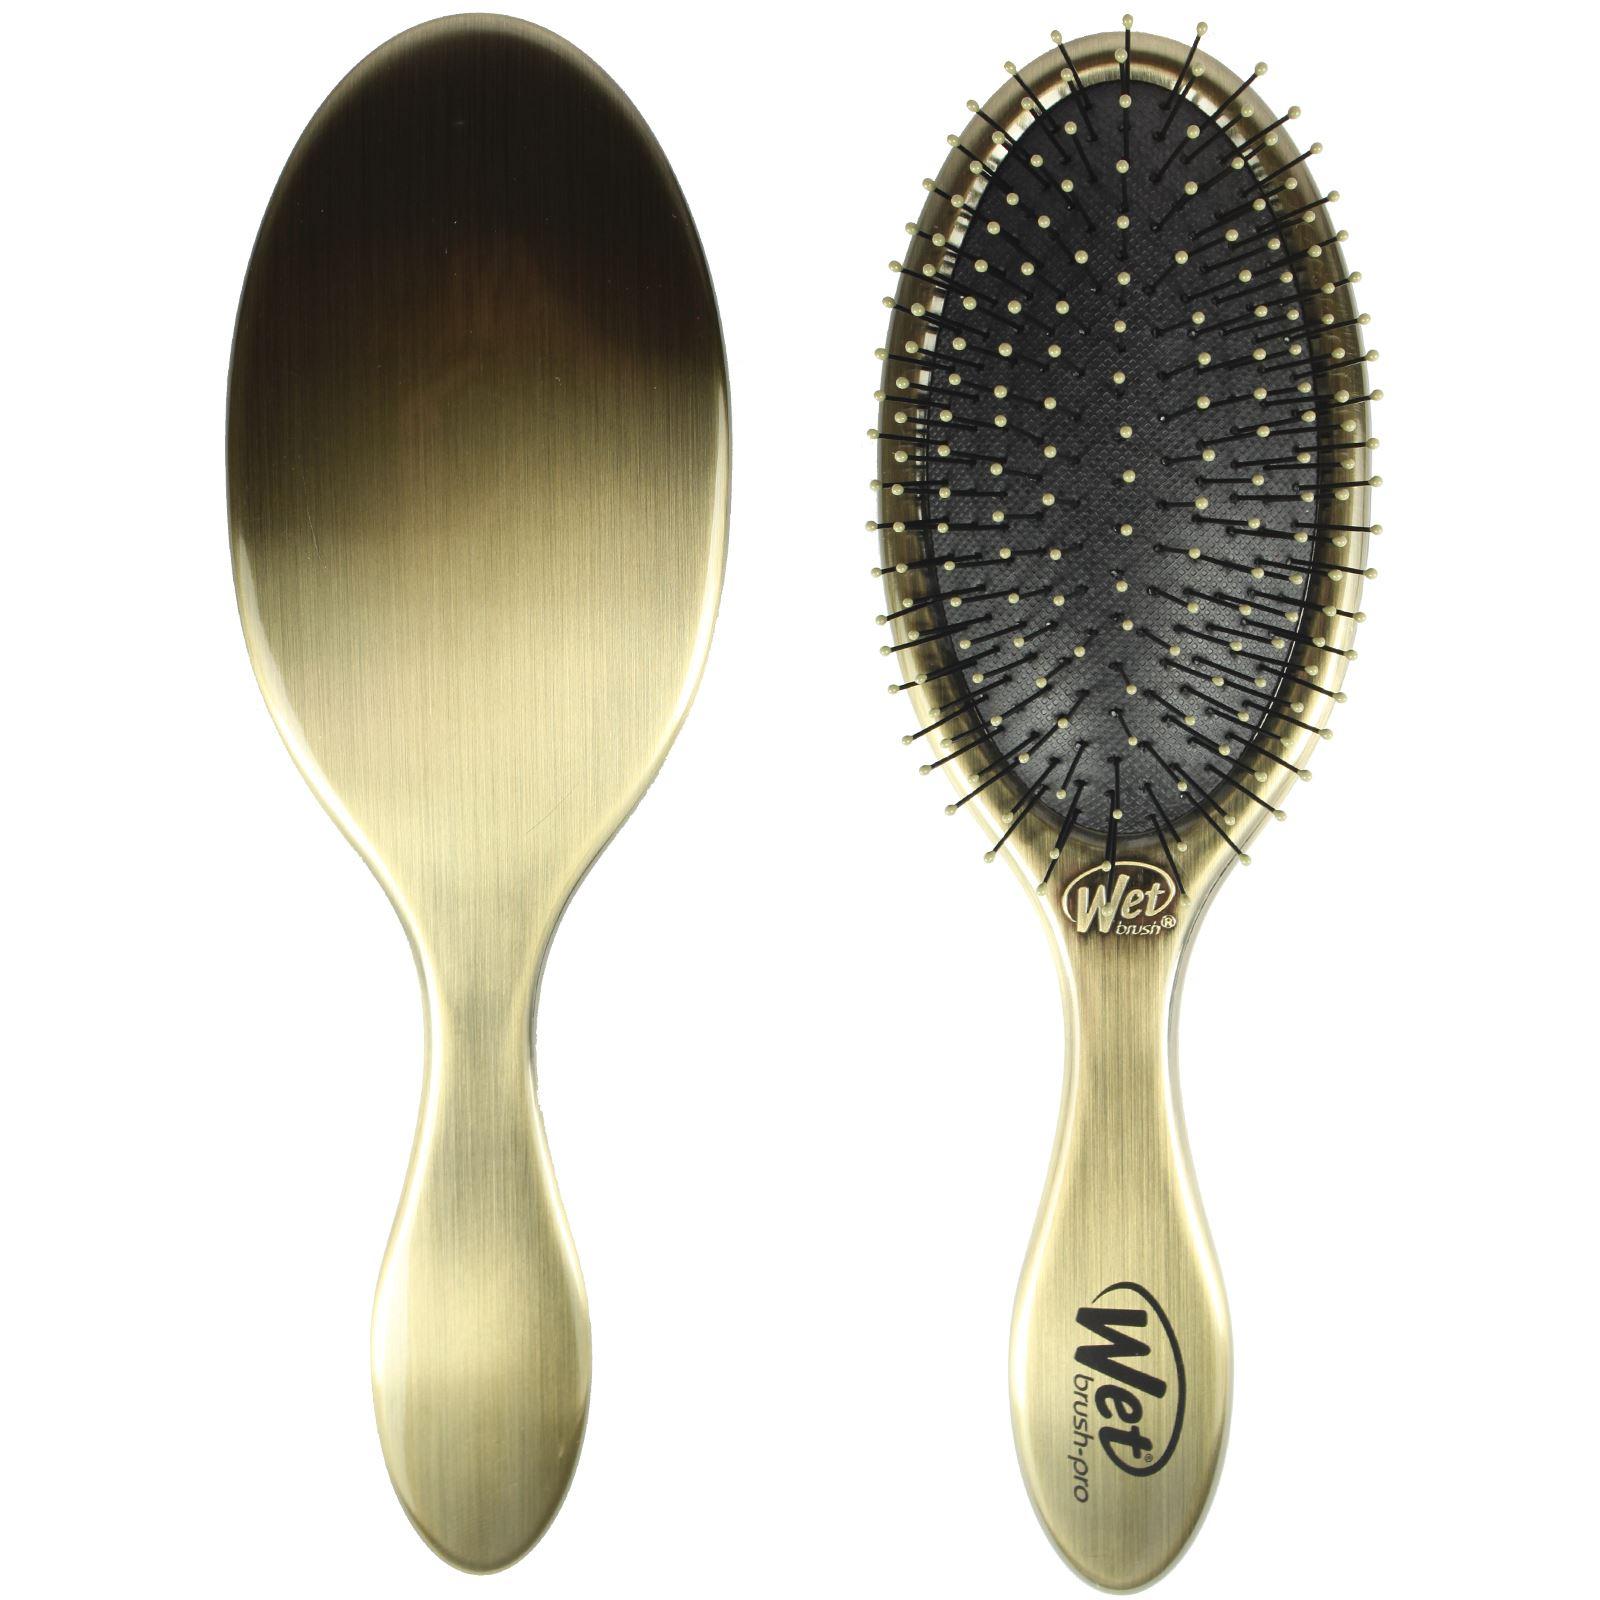 Wet Brush Pro Detangling Paddle Brush Soft Bristles Square Round